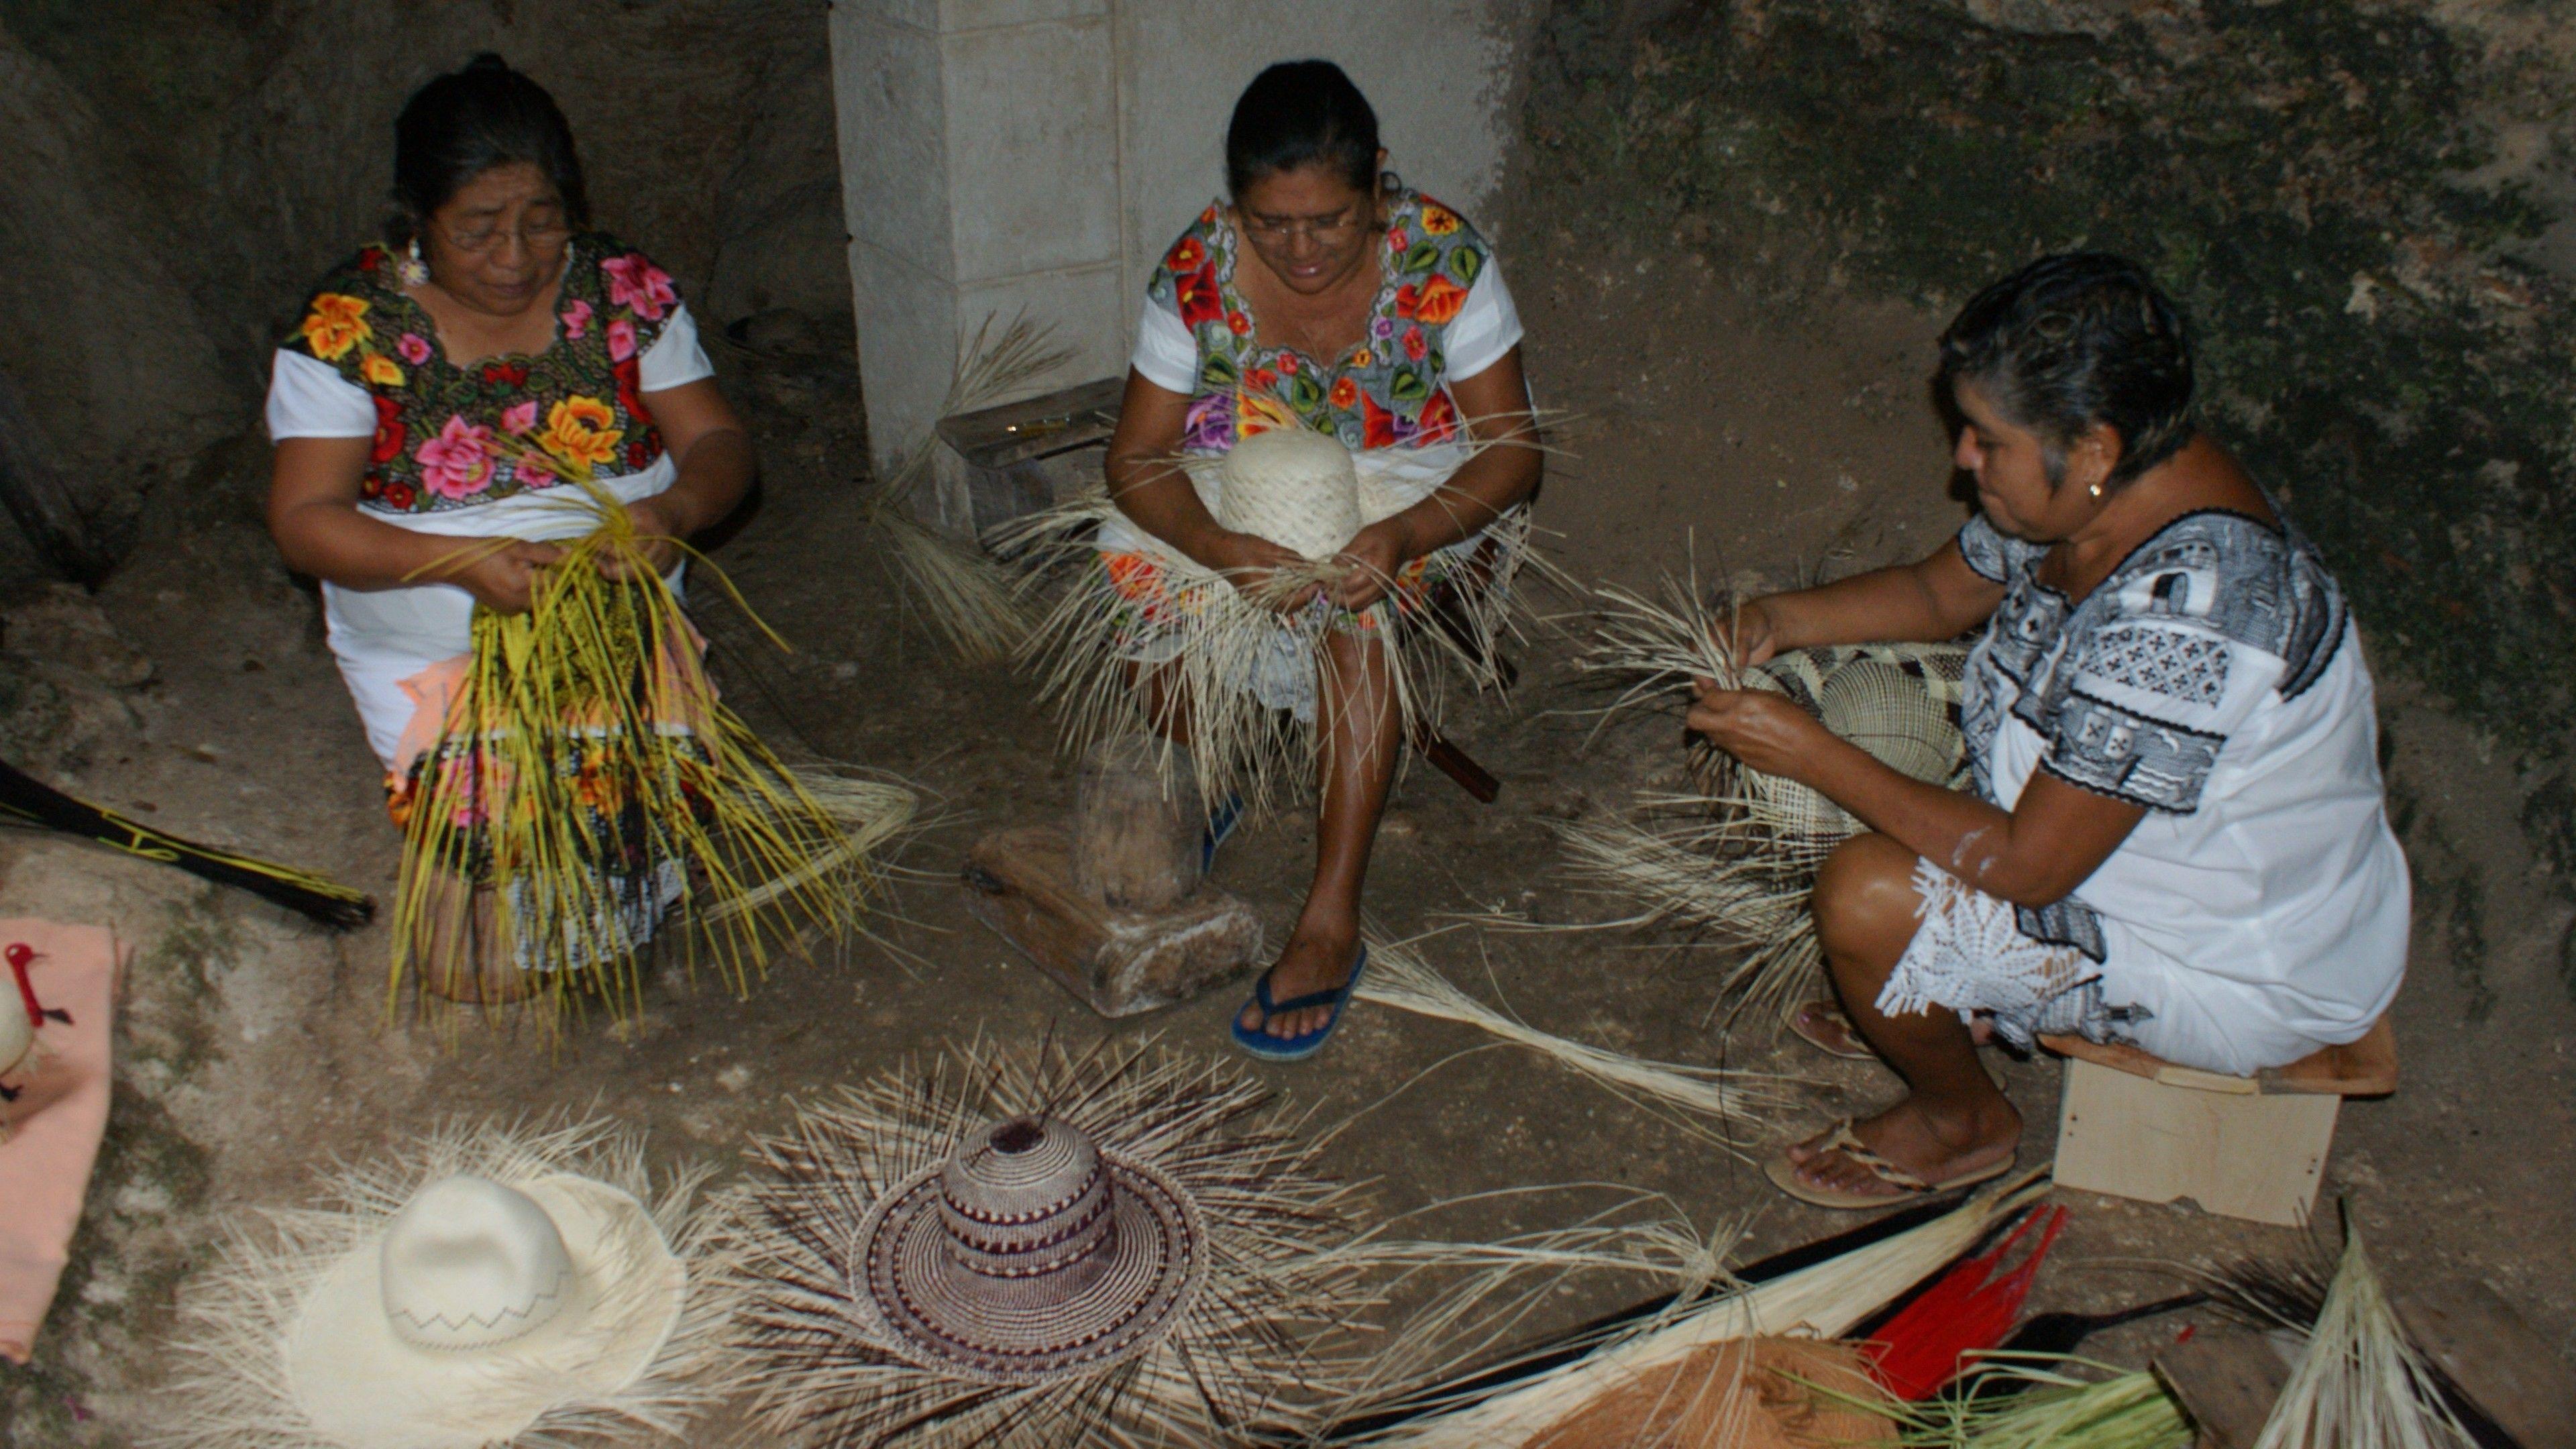 Becal & Campeche from Mérida, Yucatán